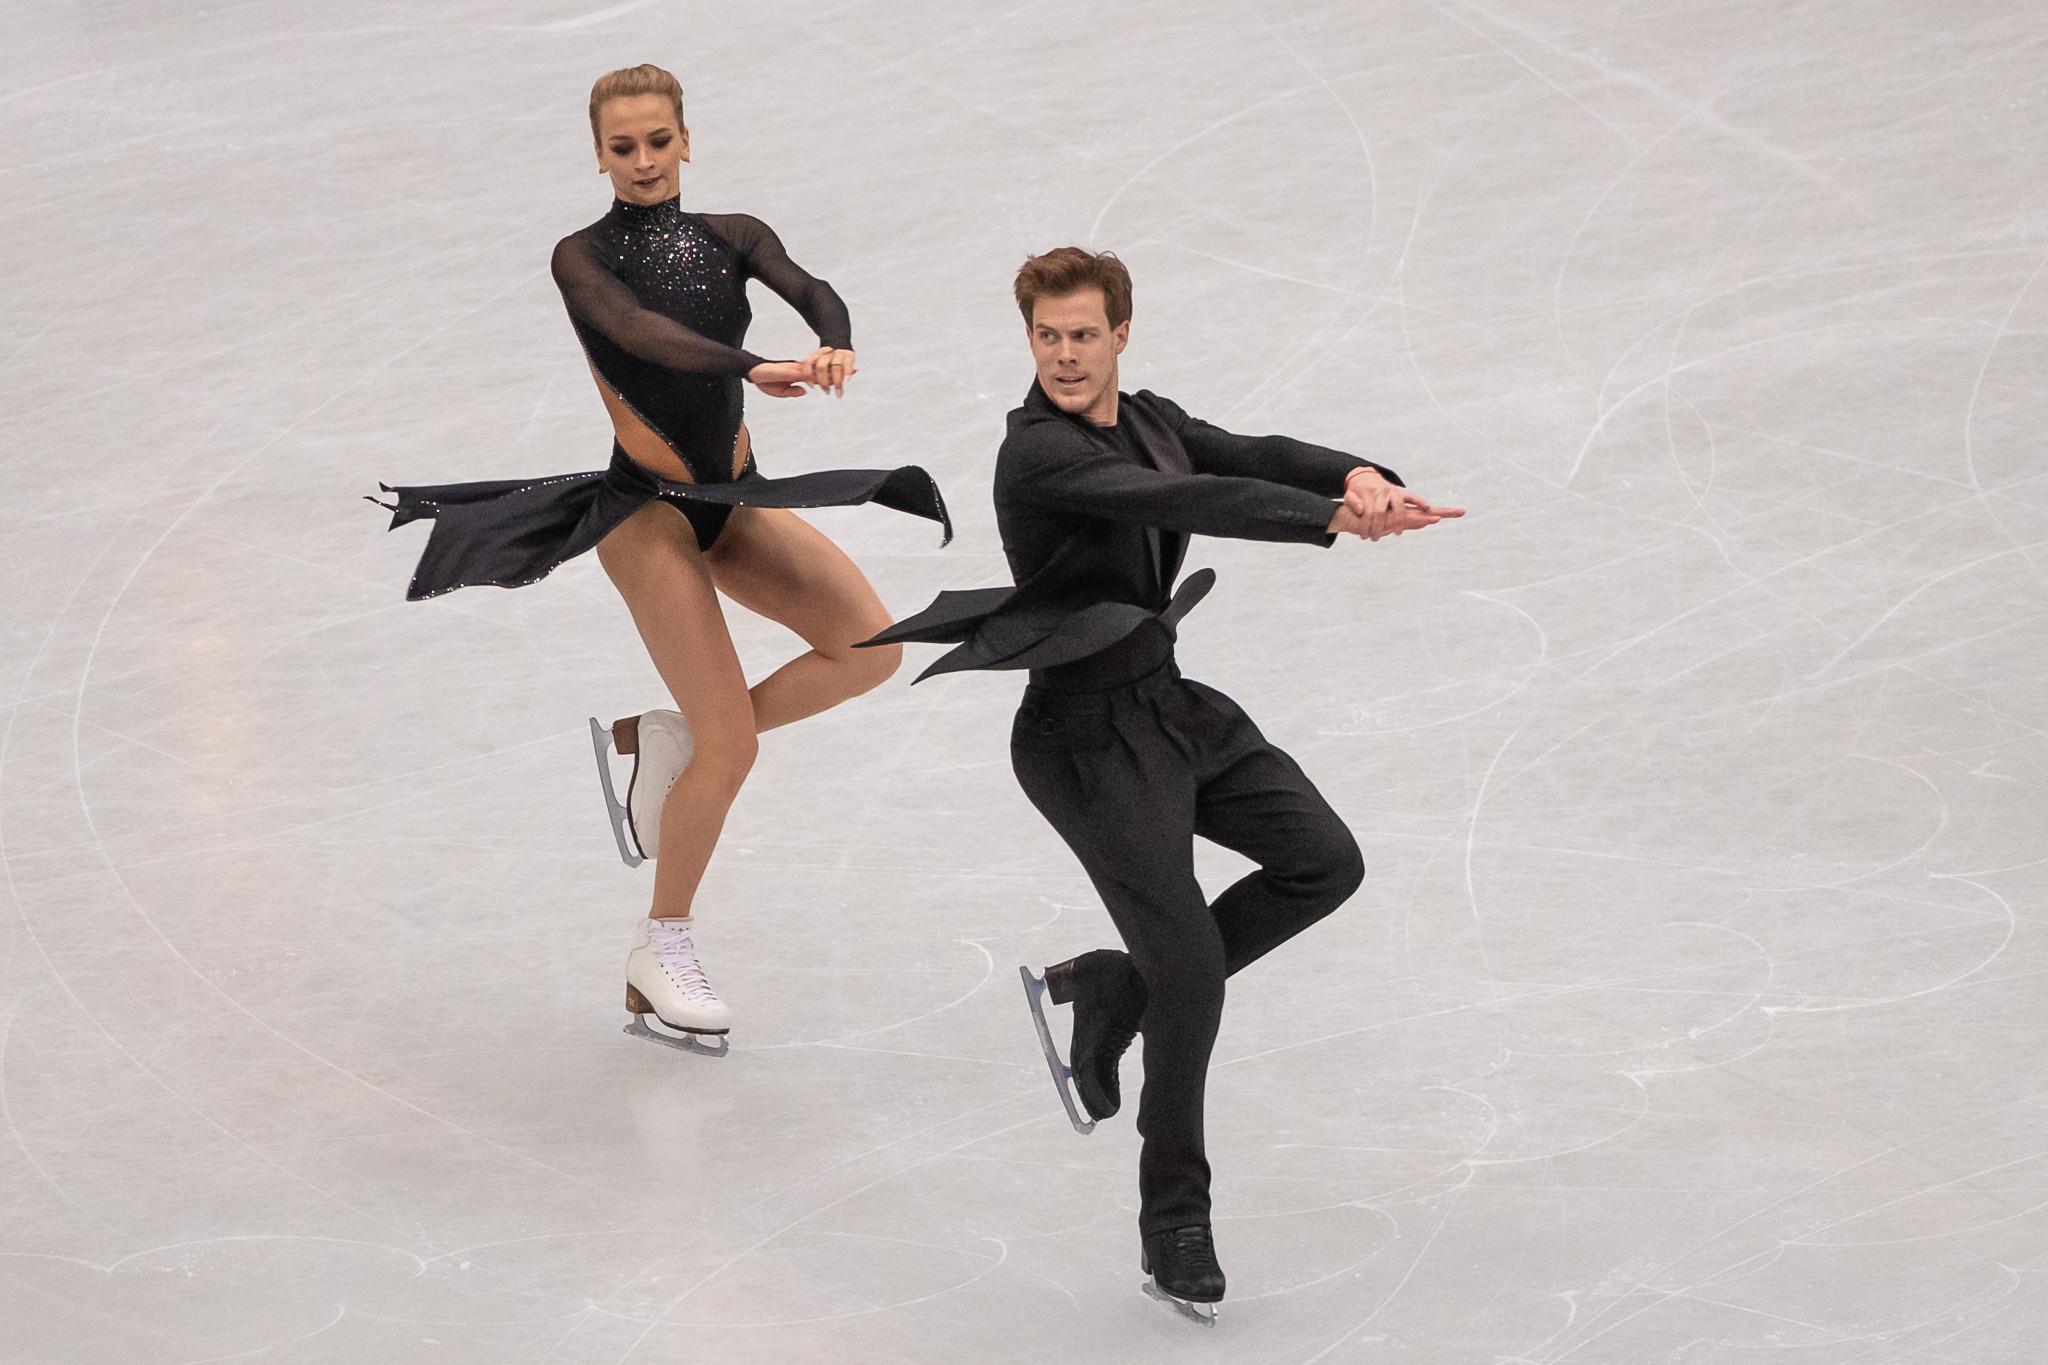 Victoria Sinitsina and Nikita Katsalapov have been hampered by injures so far this season ©Getty Images